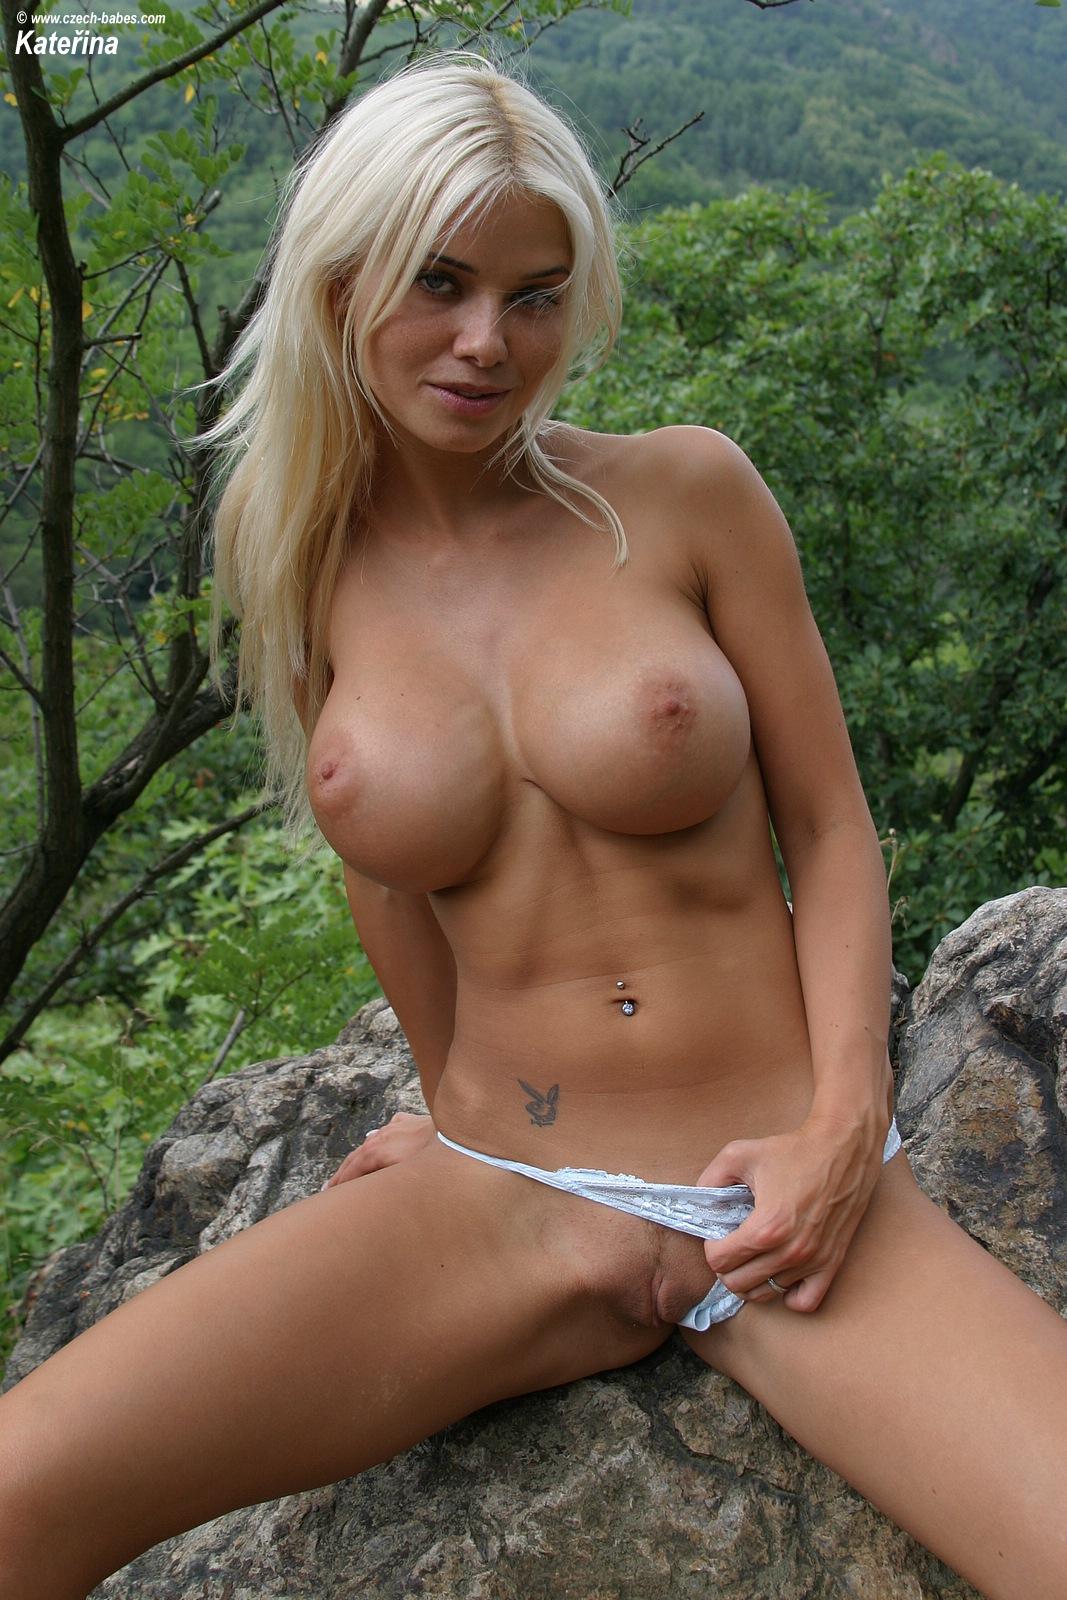 katerina-nude-mountain-lingerie-huge-tits-blonde-15